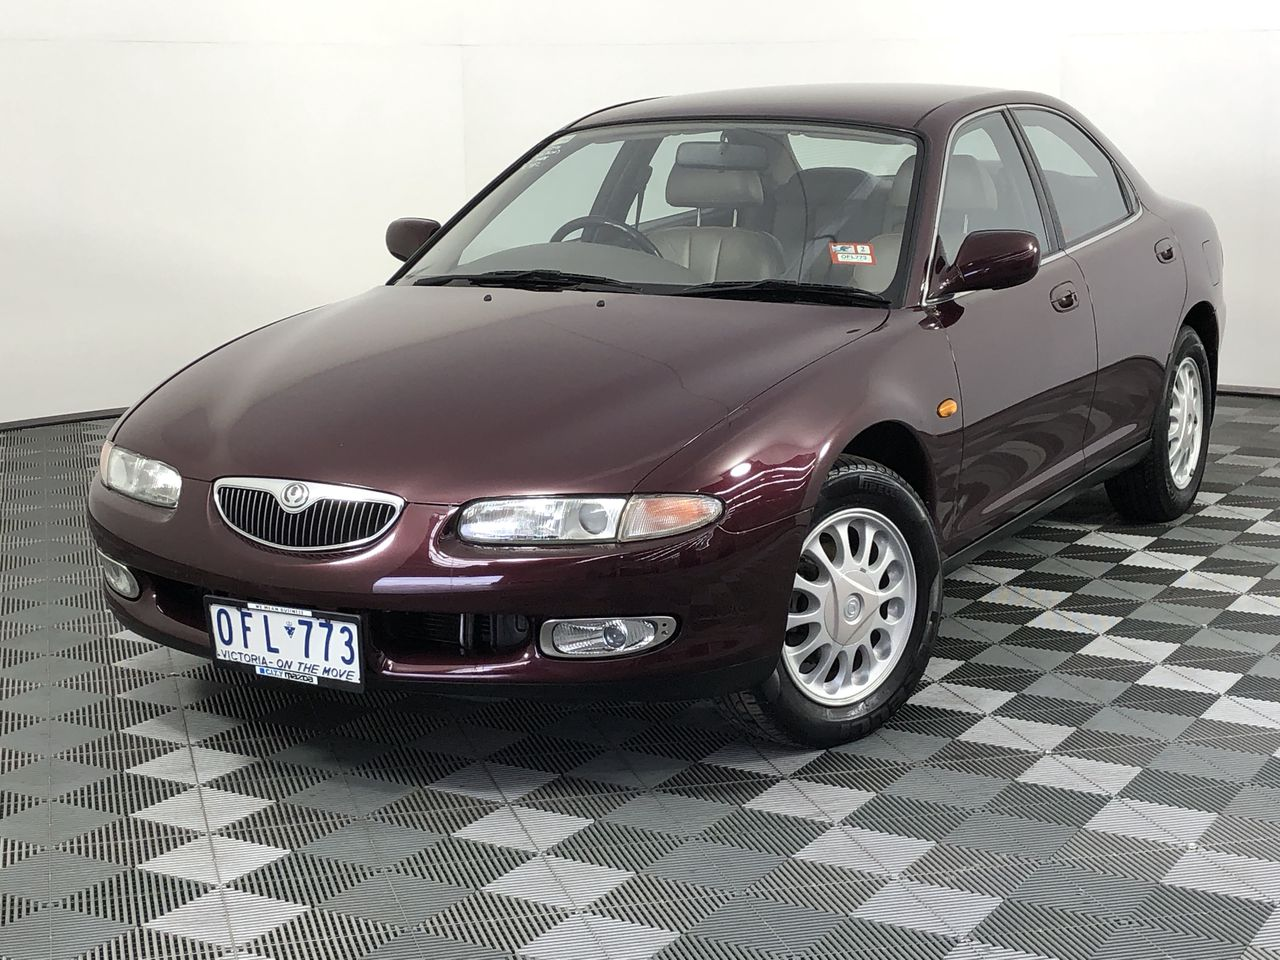 1997 Mazda Eunos 500 Automatic Sedan